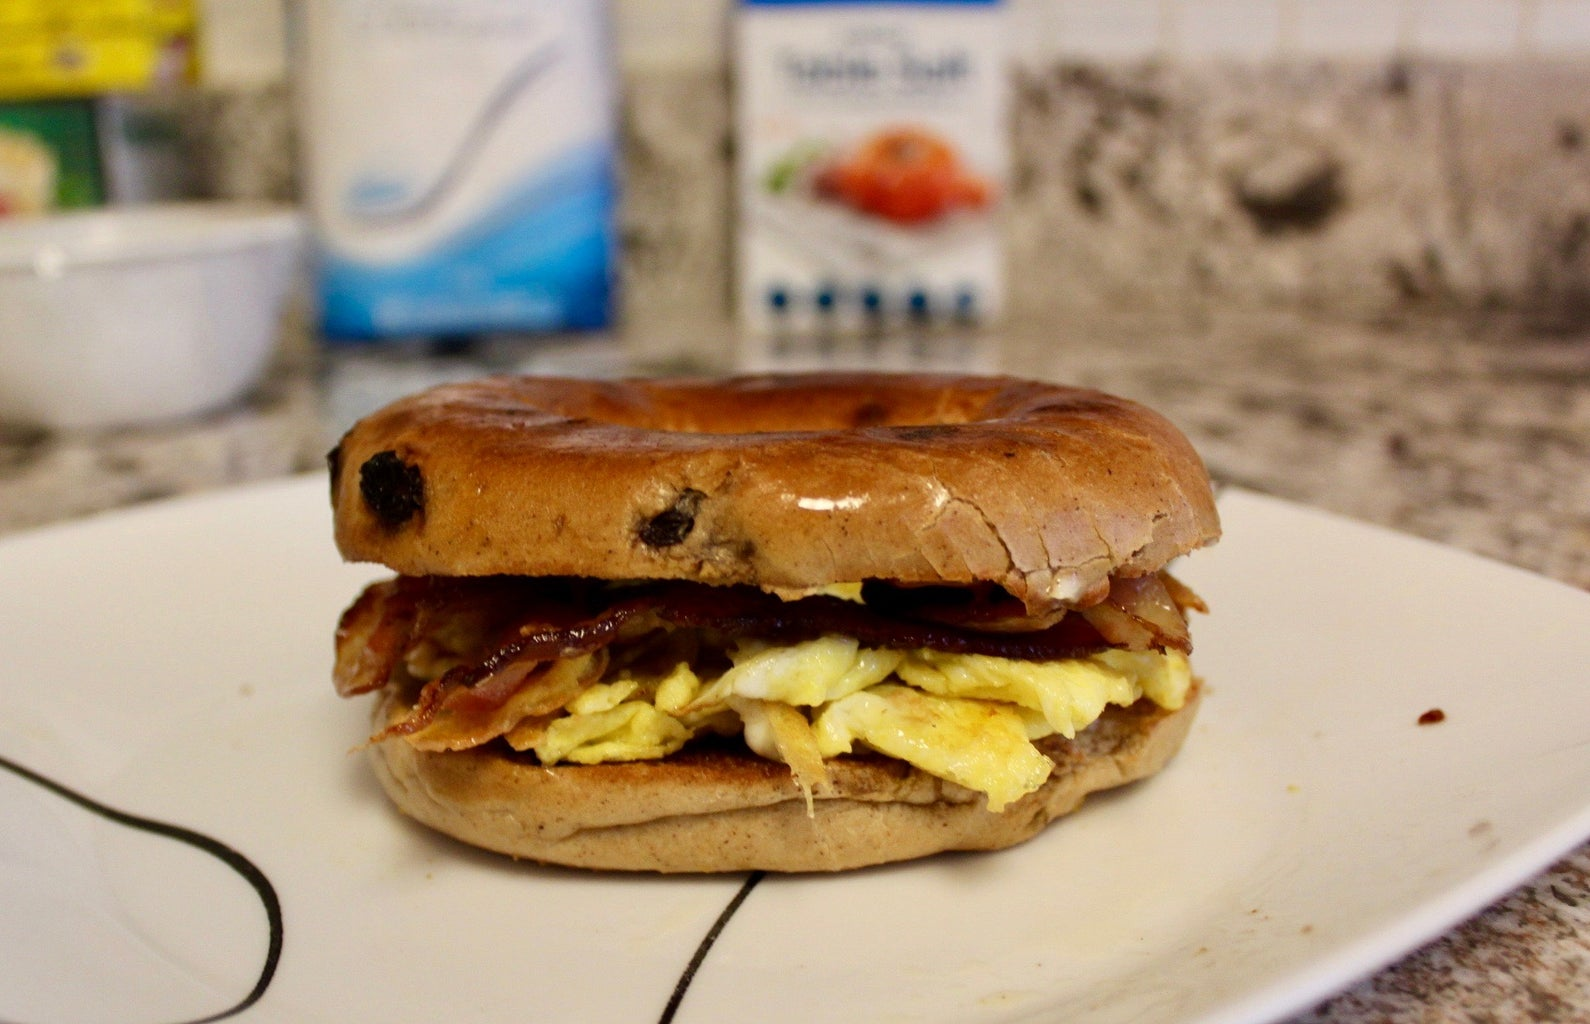 Assembling the Bagel Sandwich